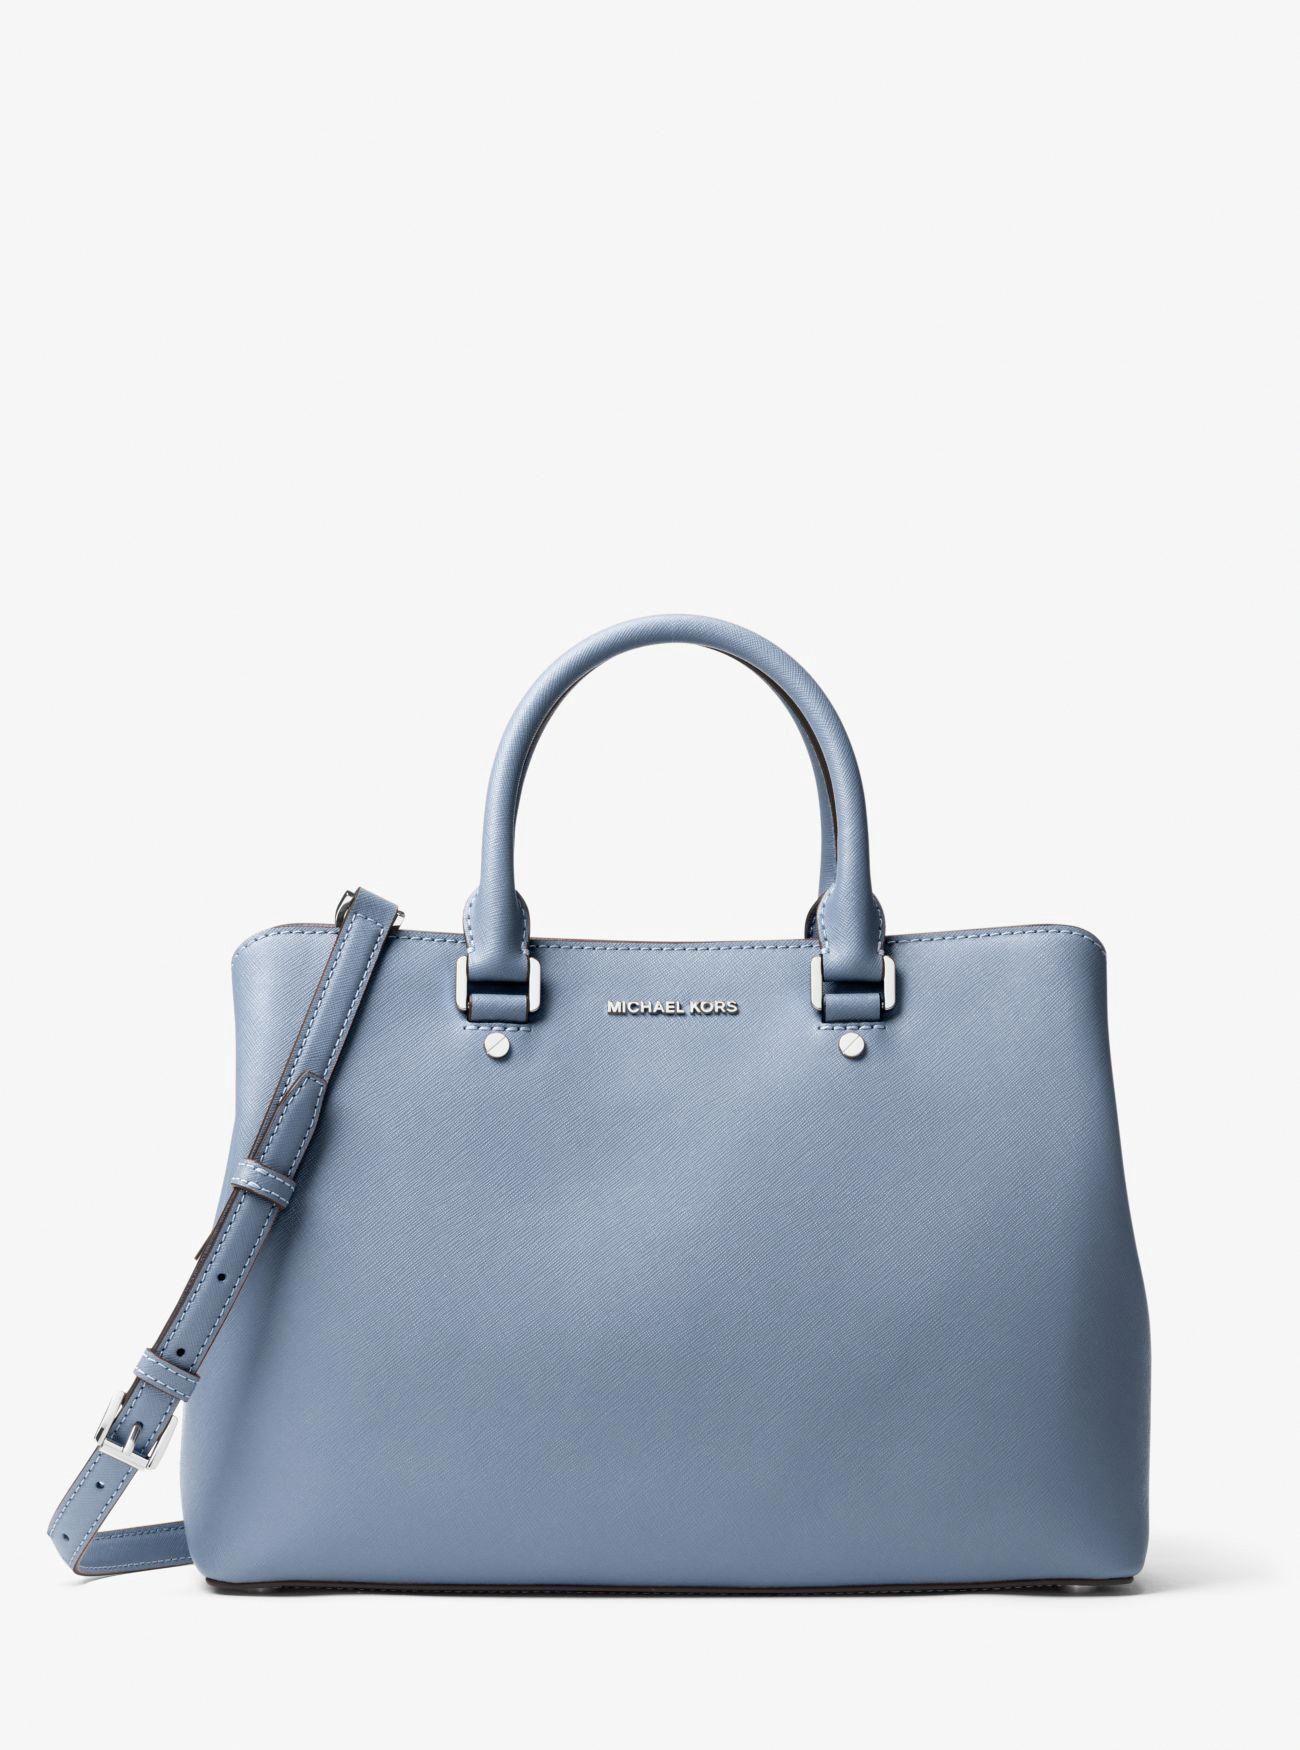 965d55c56578 Michael Kors Savannah Large Saffiano Leather Satchel - Pearl Grey  #Handbagsmichaelkors